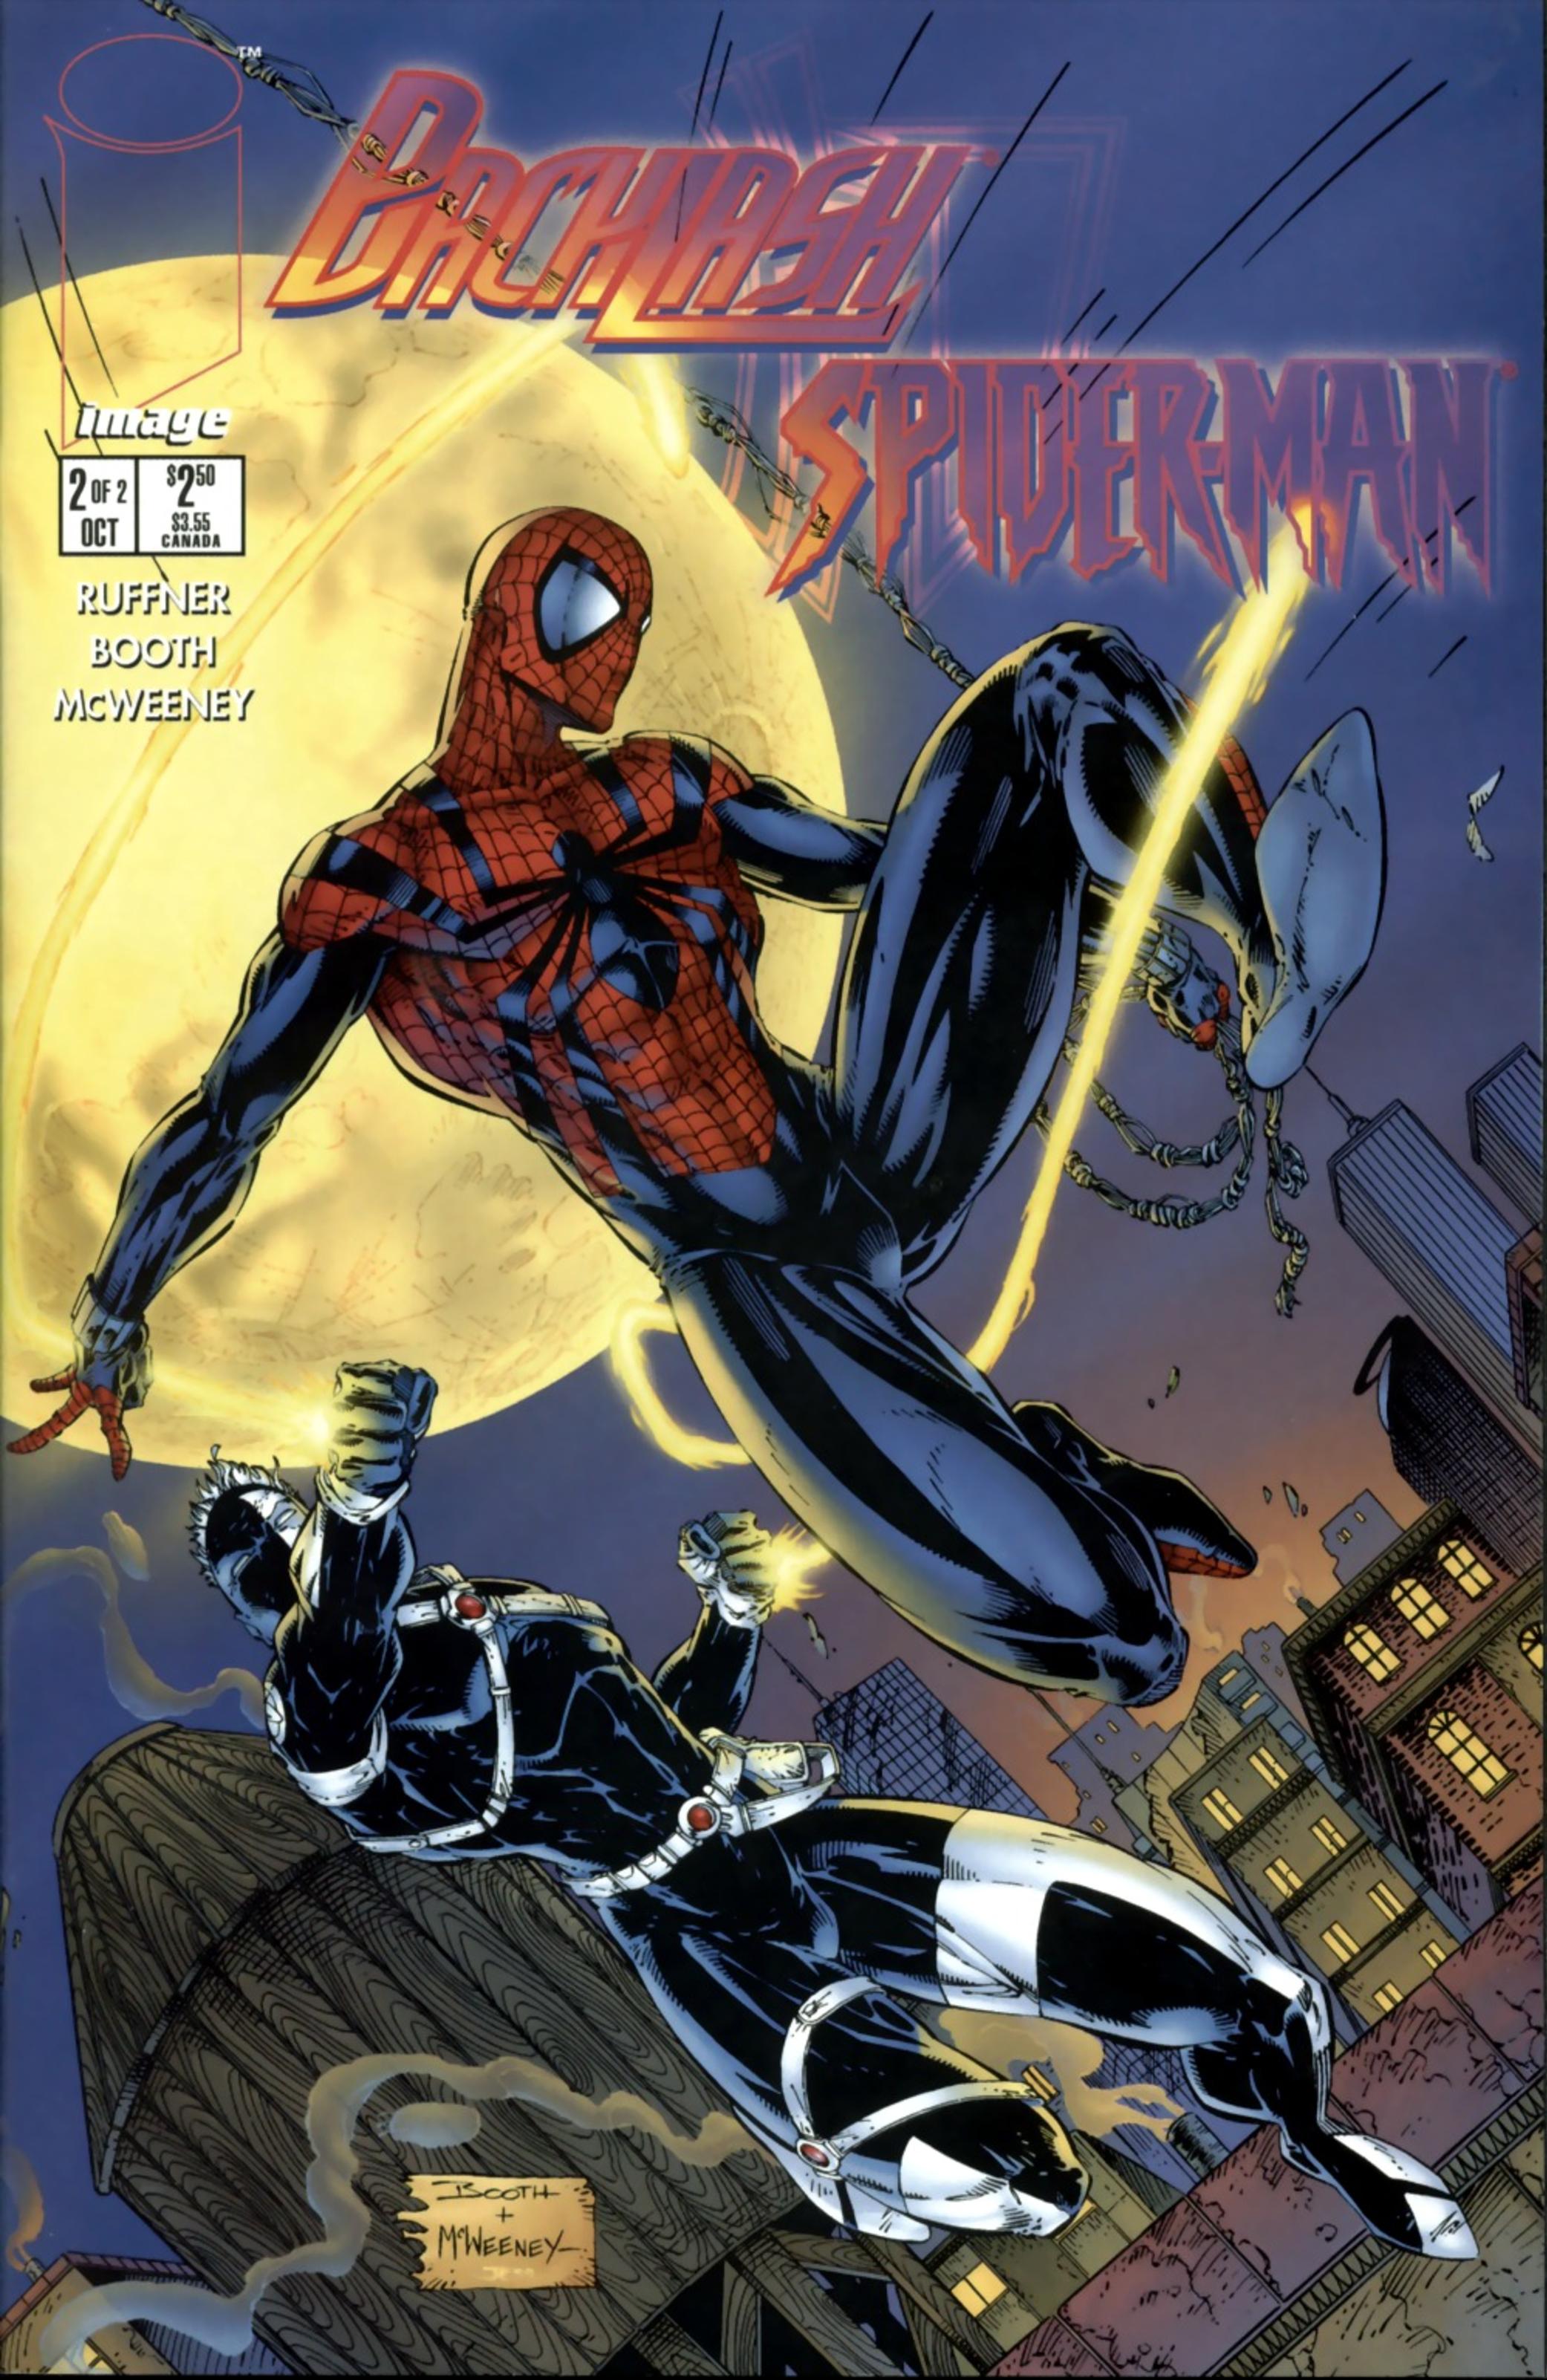 Backlash comic image comics inc backlash and spider man - Marvel spiderman comics pdf ...